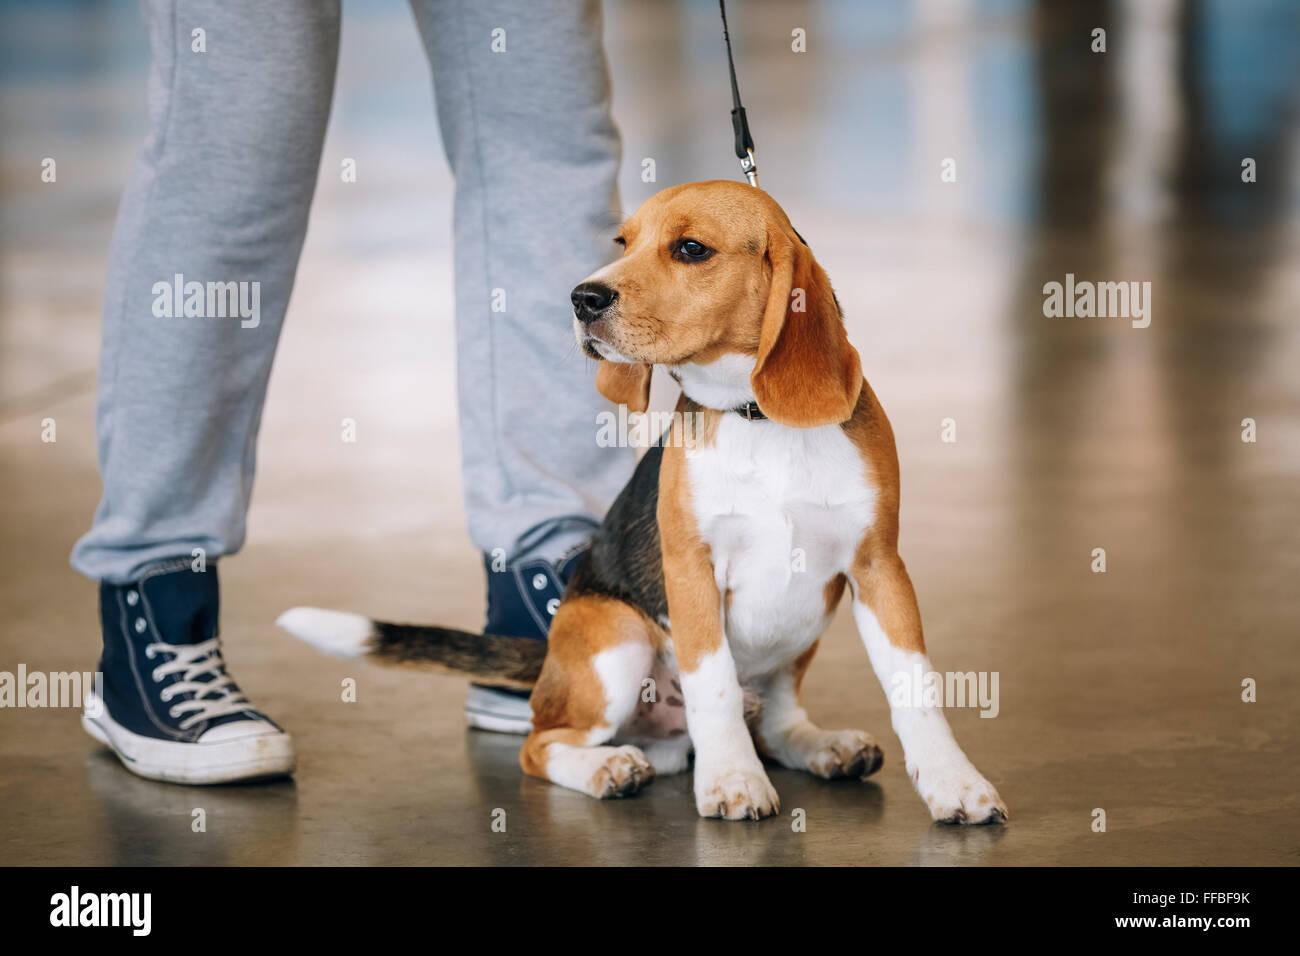 Young Beagle Dog Sitting Near Owner. - Stock Image